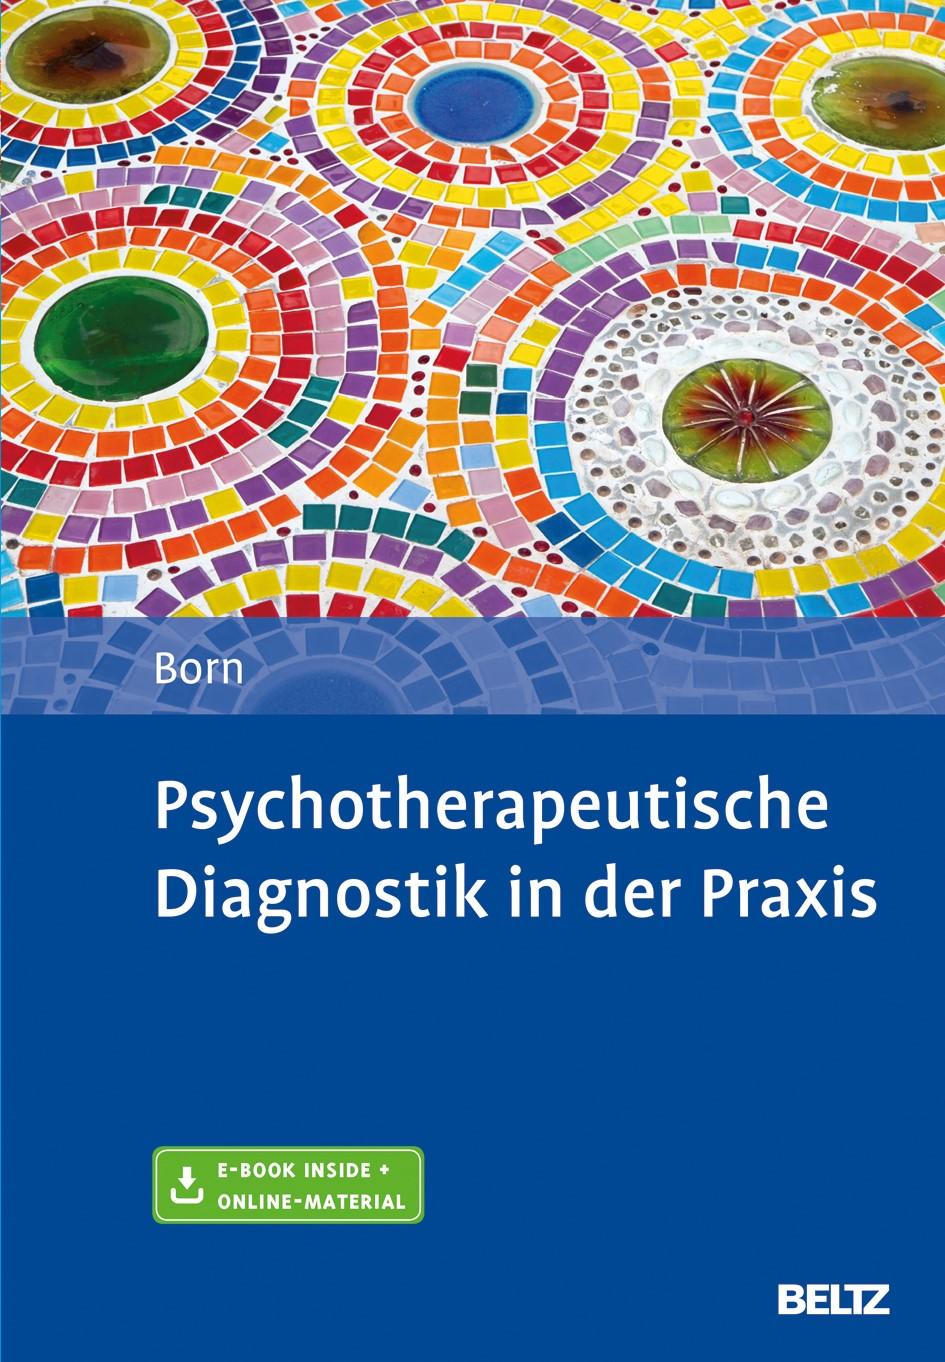 Psychotherapeutische Diagnostik in der Praxis | Born, 2014 | Buch (Cover)